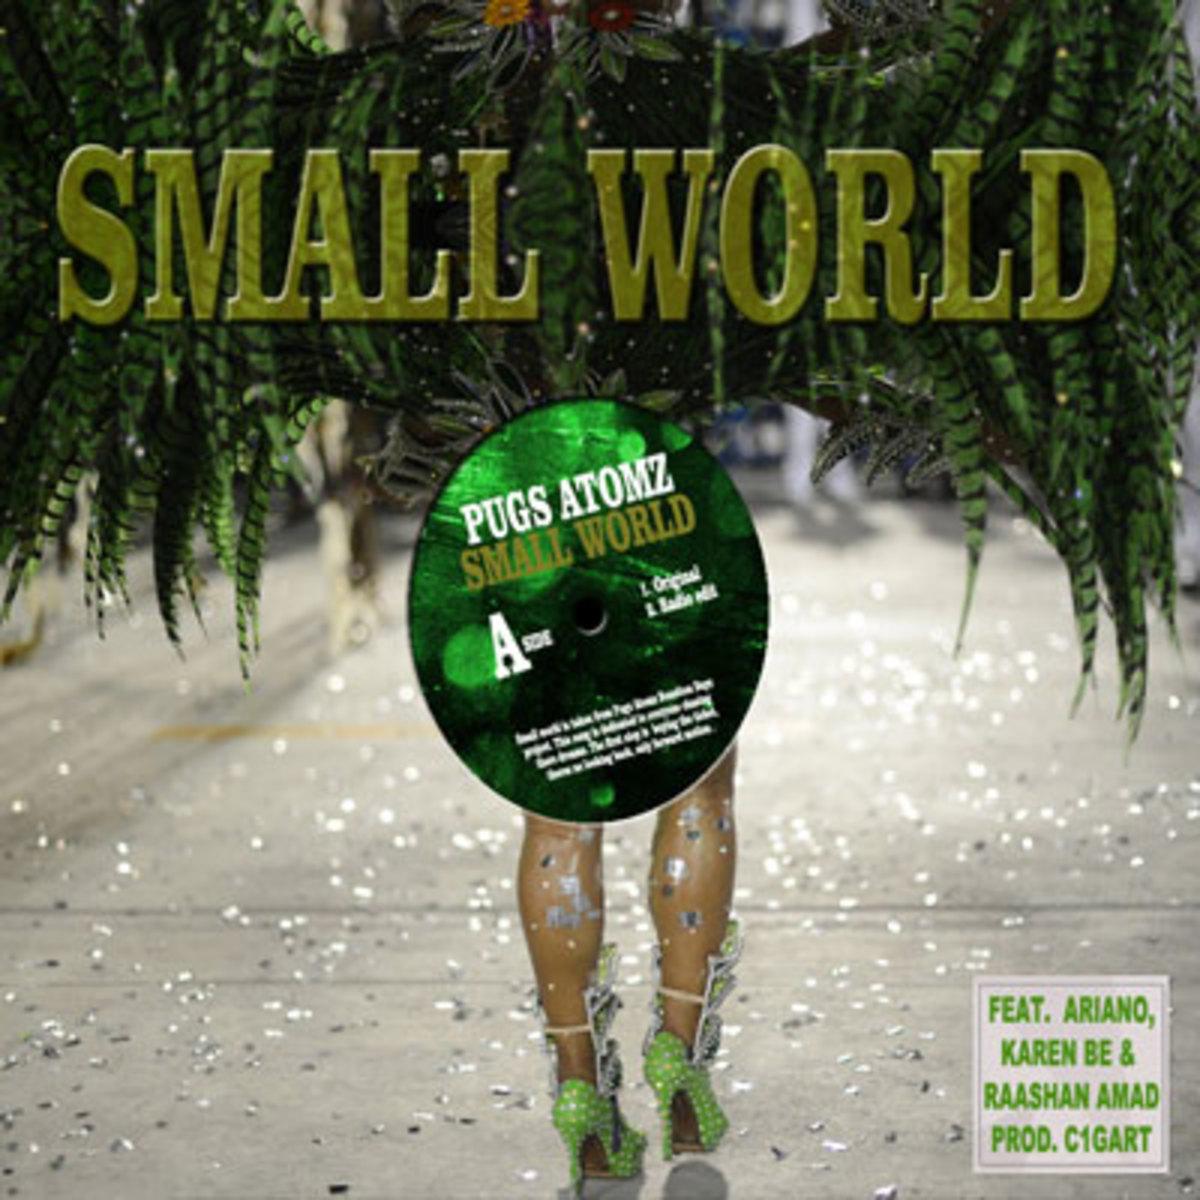 pugsatomz-smallworld.jpg